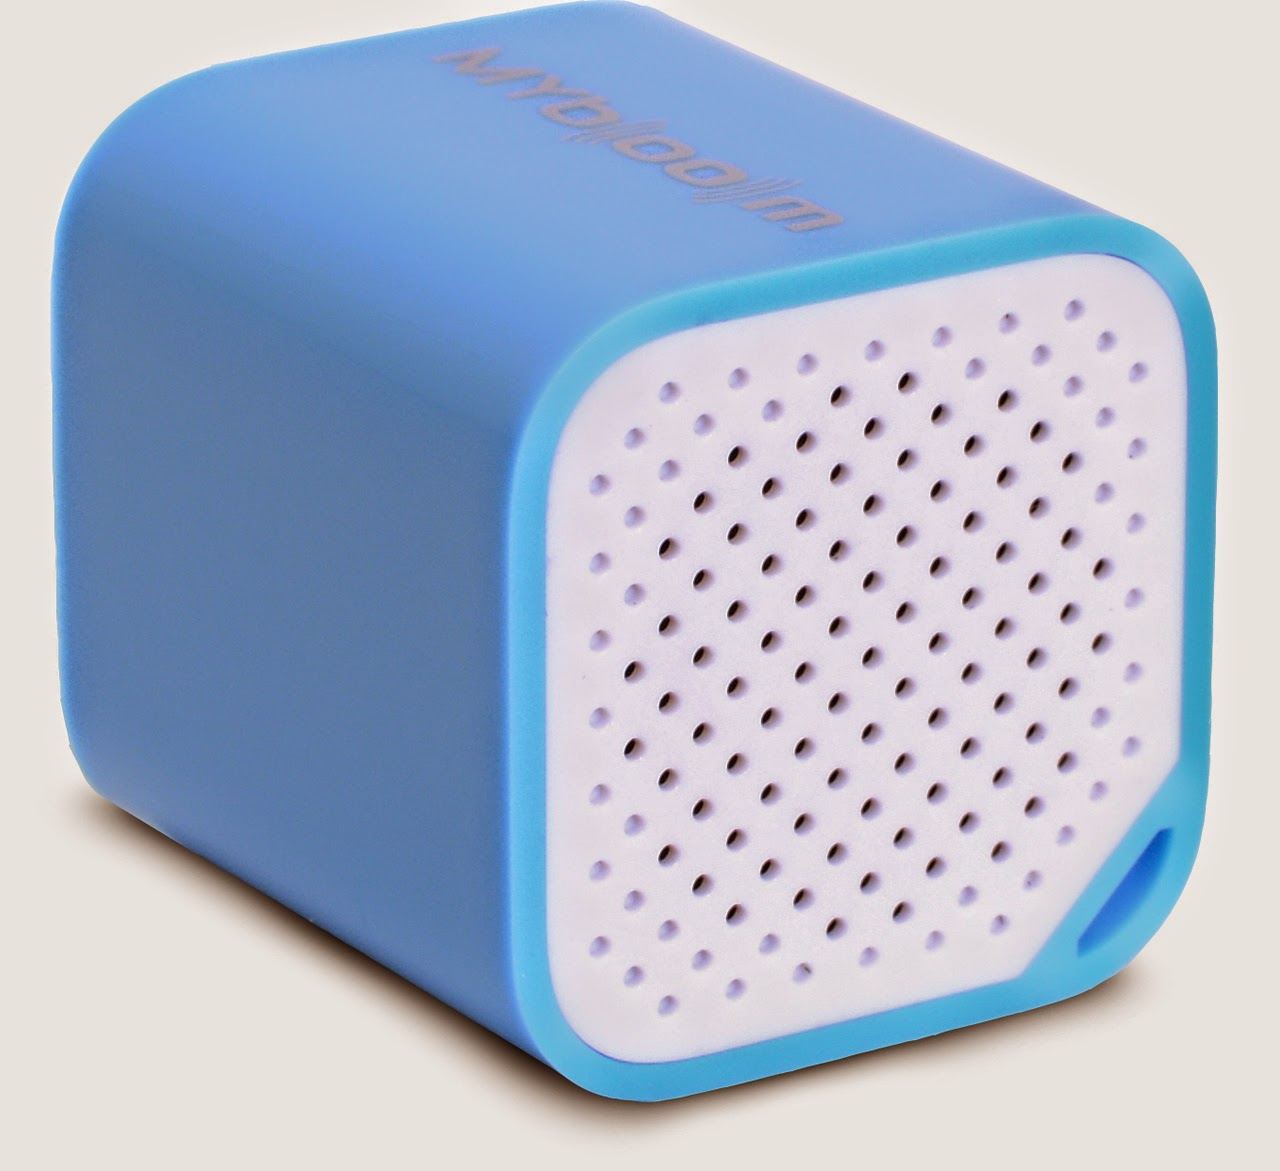 boom speakers image